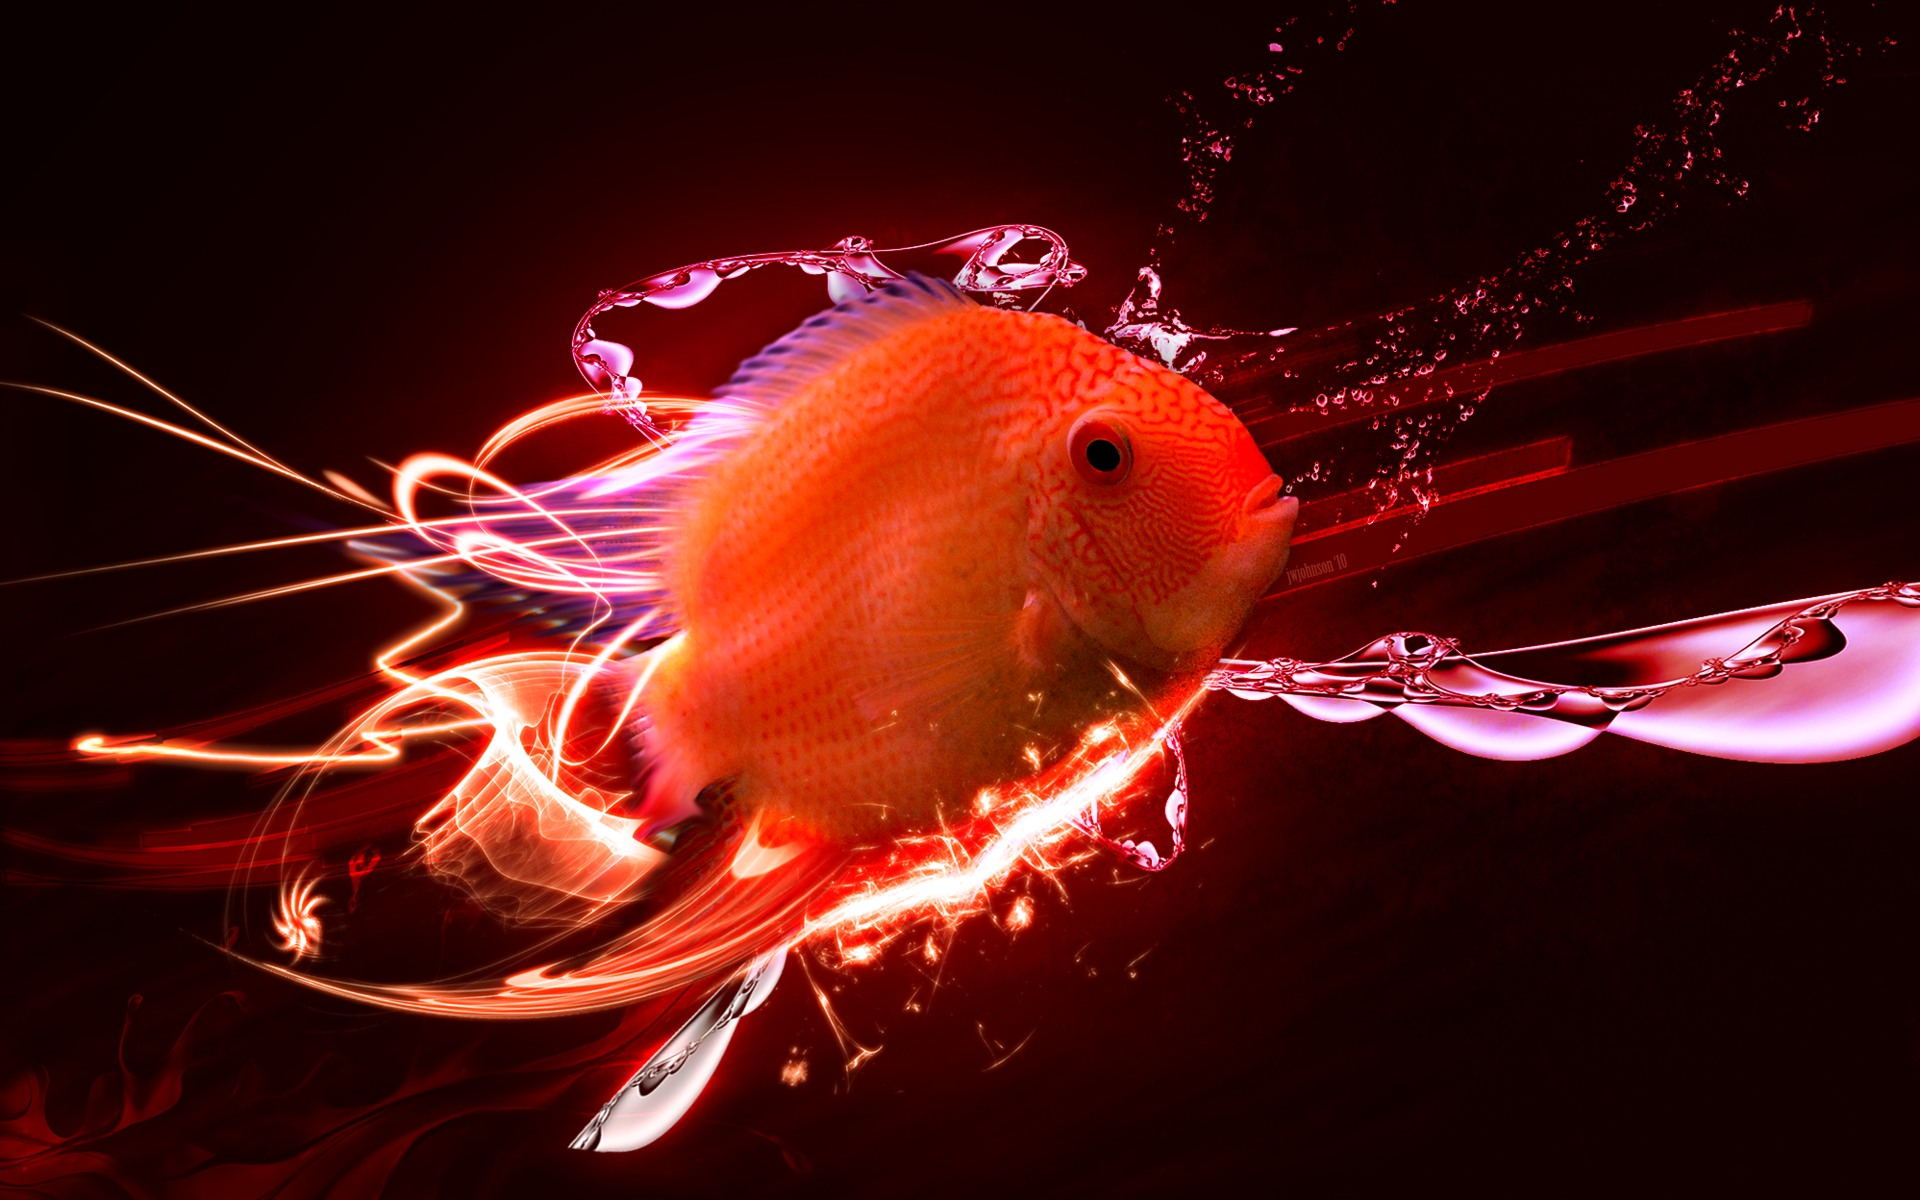 fish marlin desktop 1920x1200 - photo #46